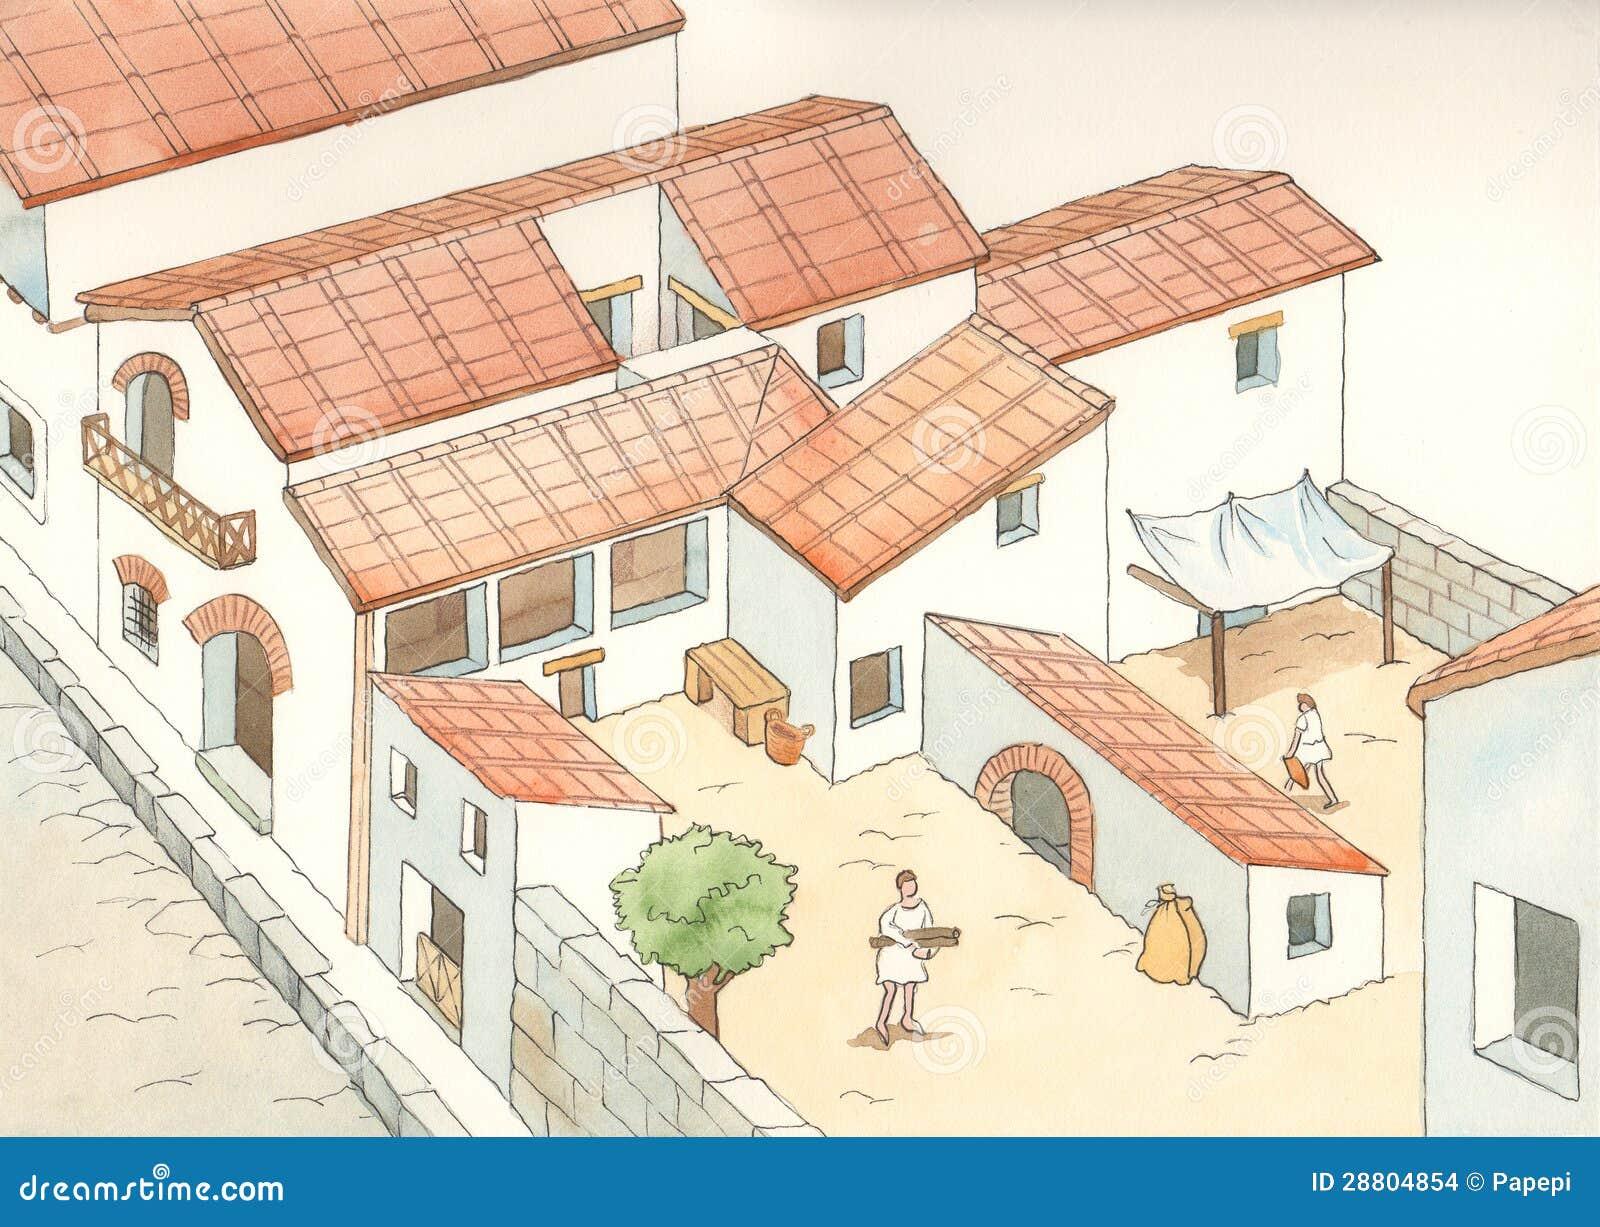 Roma Antigua Imagenes de archivo - Imagen: 28804854